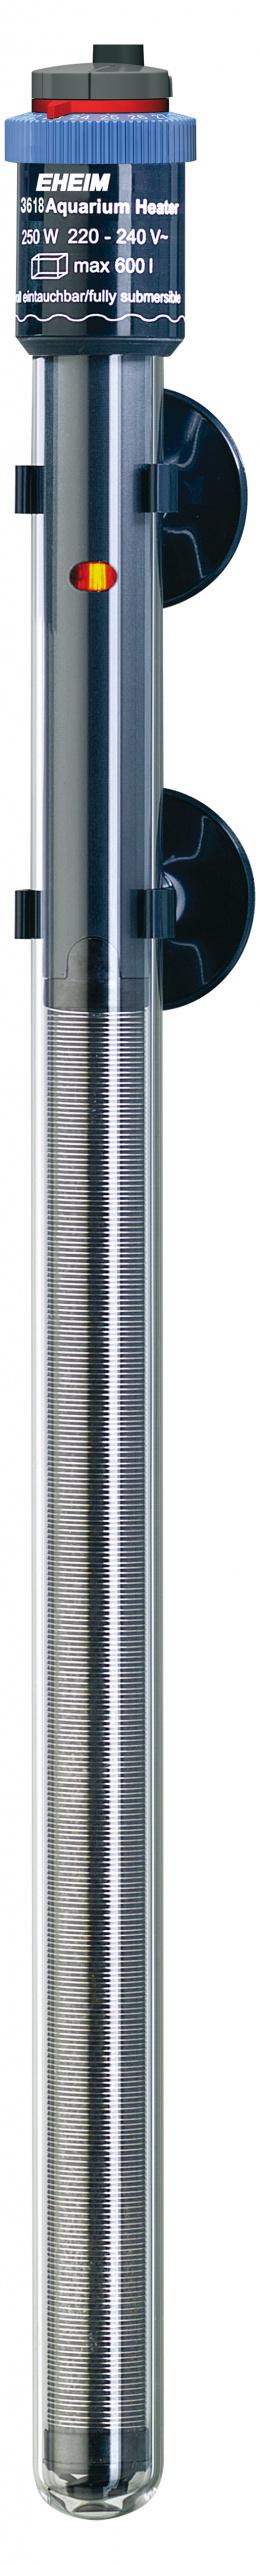 Ohrievac  EHEIM Thermocontrol 250W,400-600l